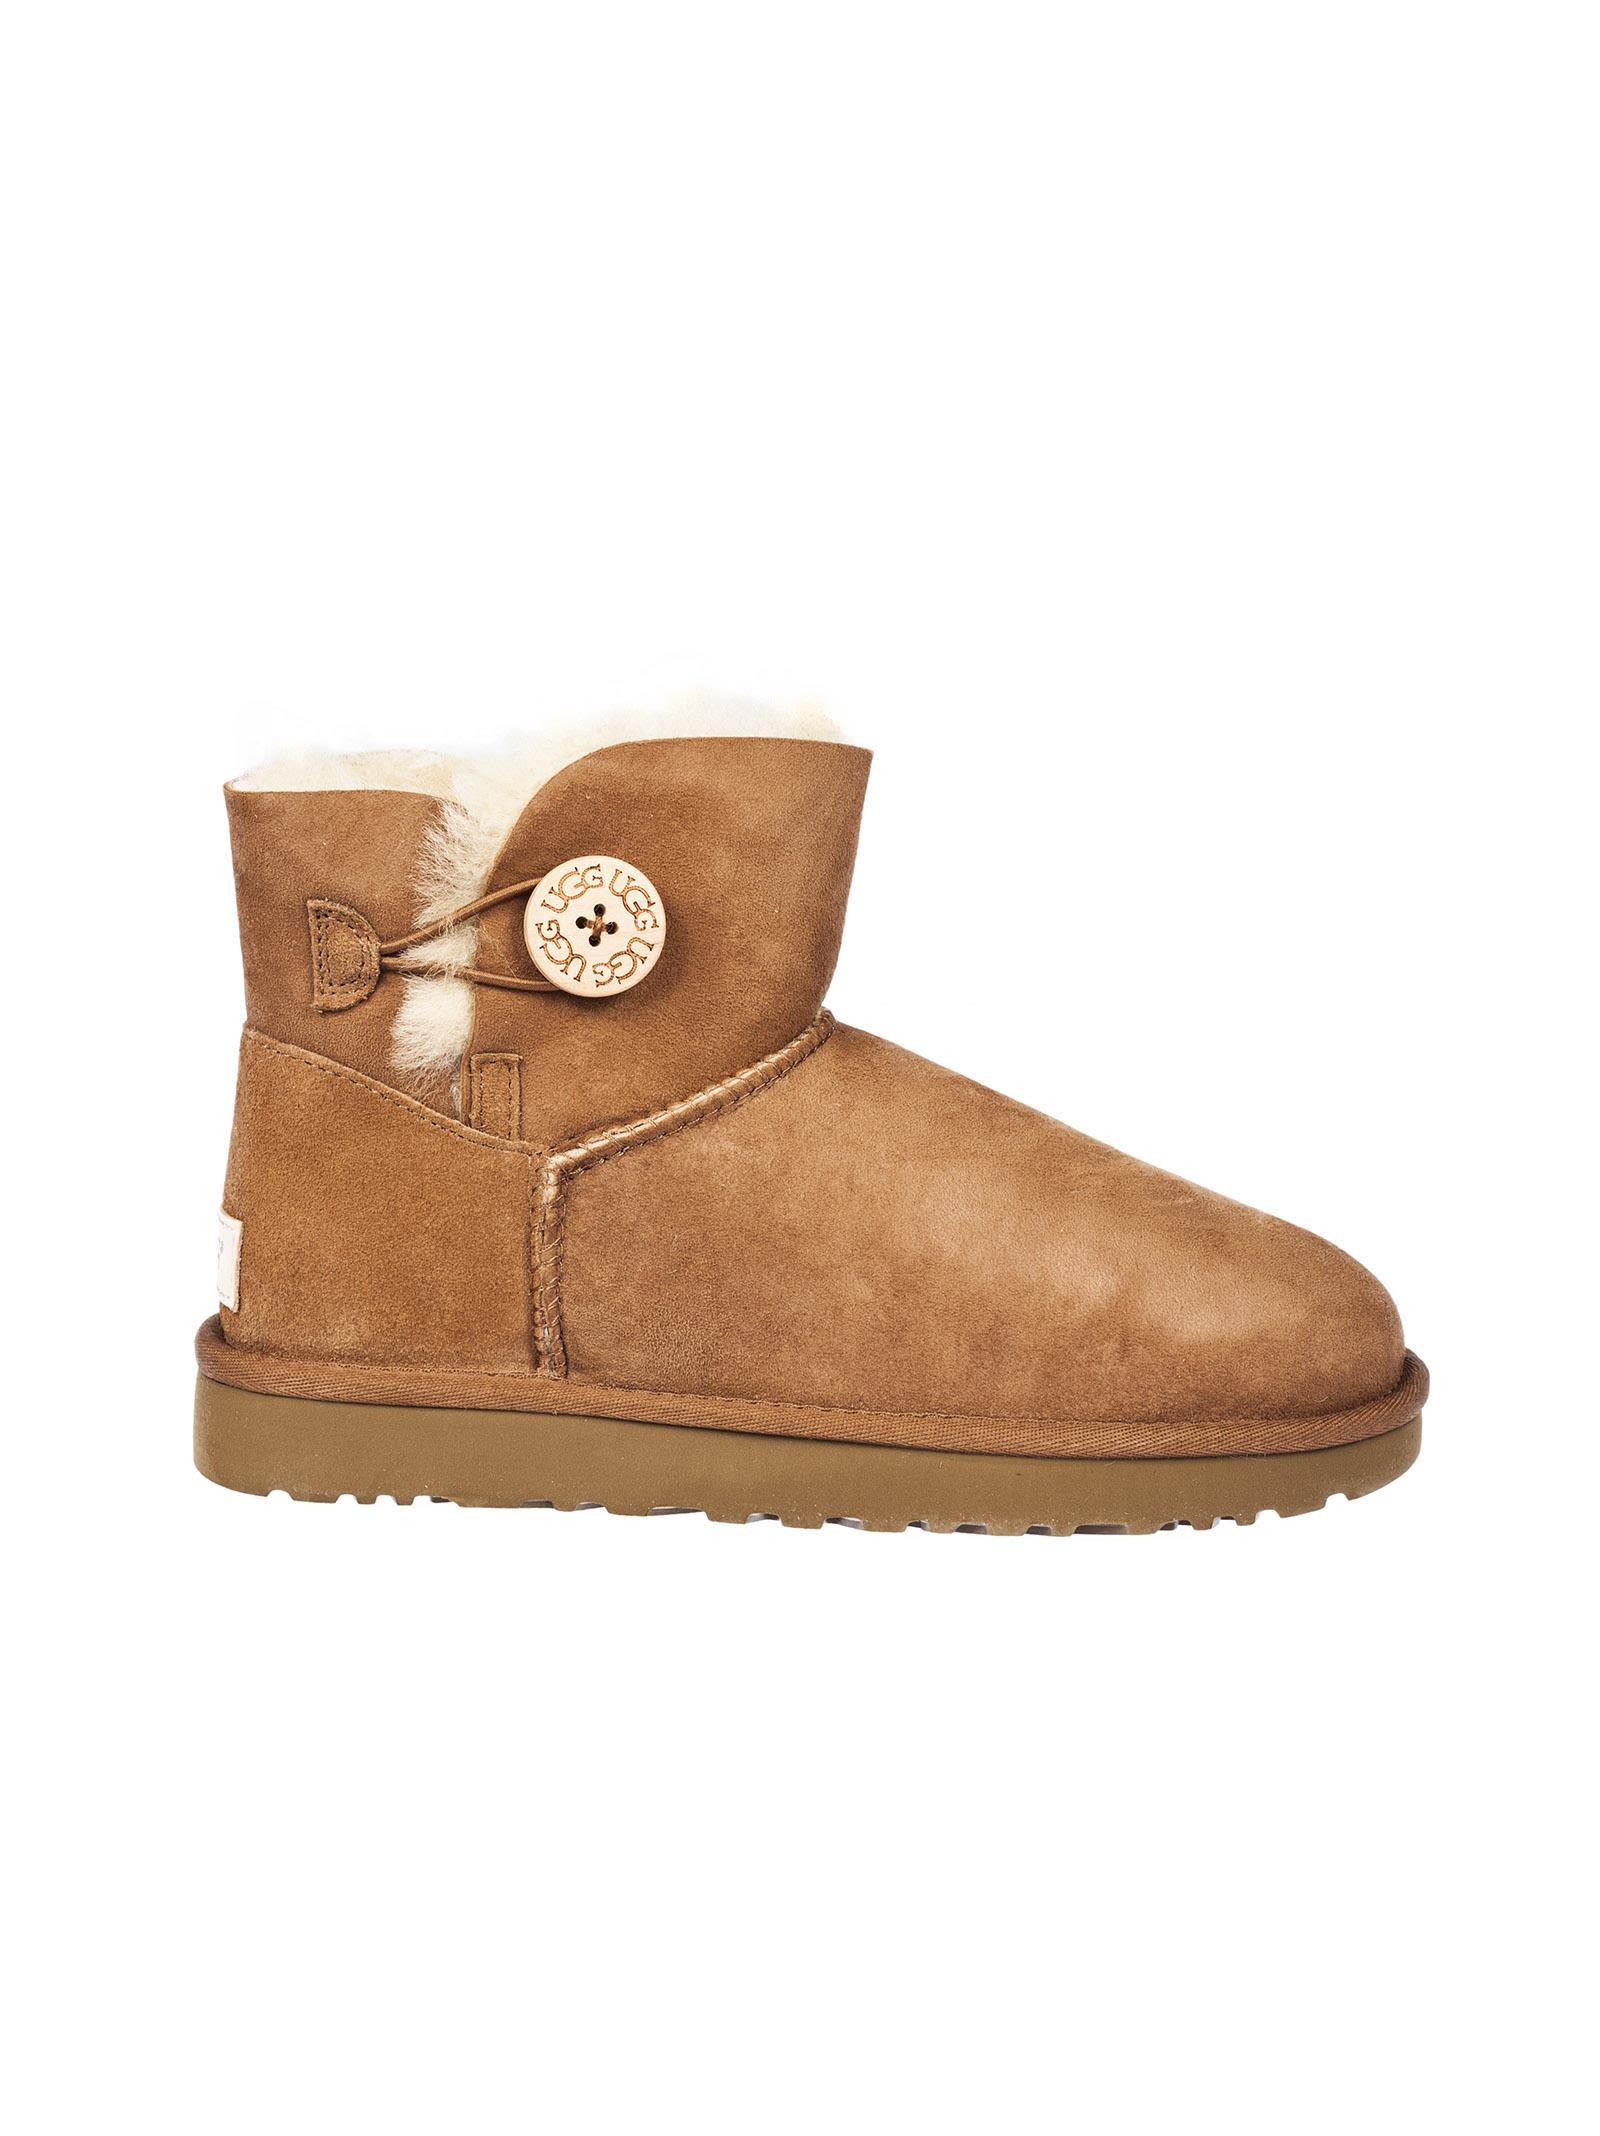 Ugg Mini Bailey Button Ii Boots